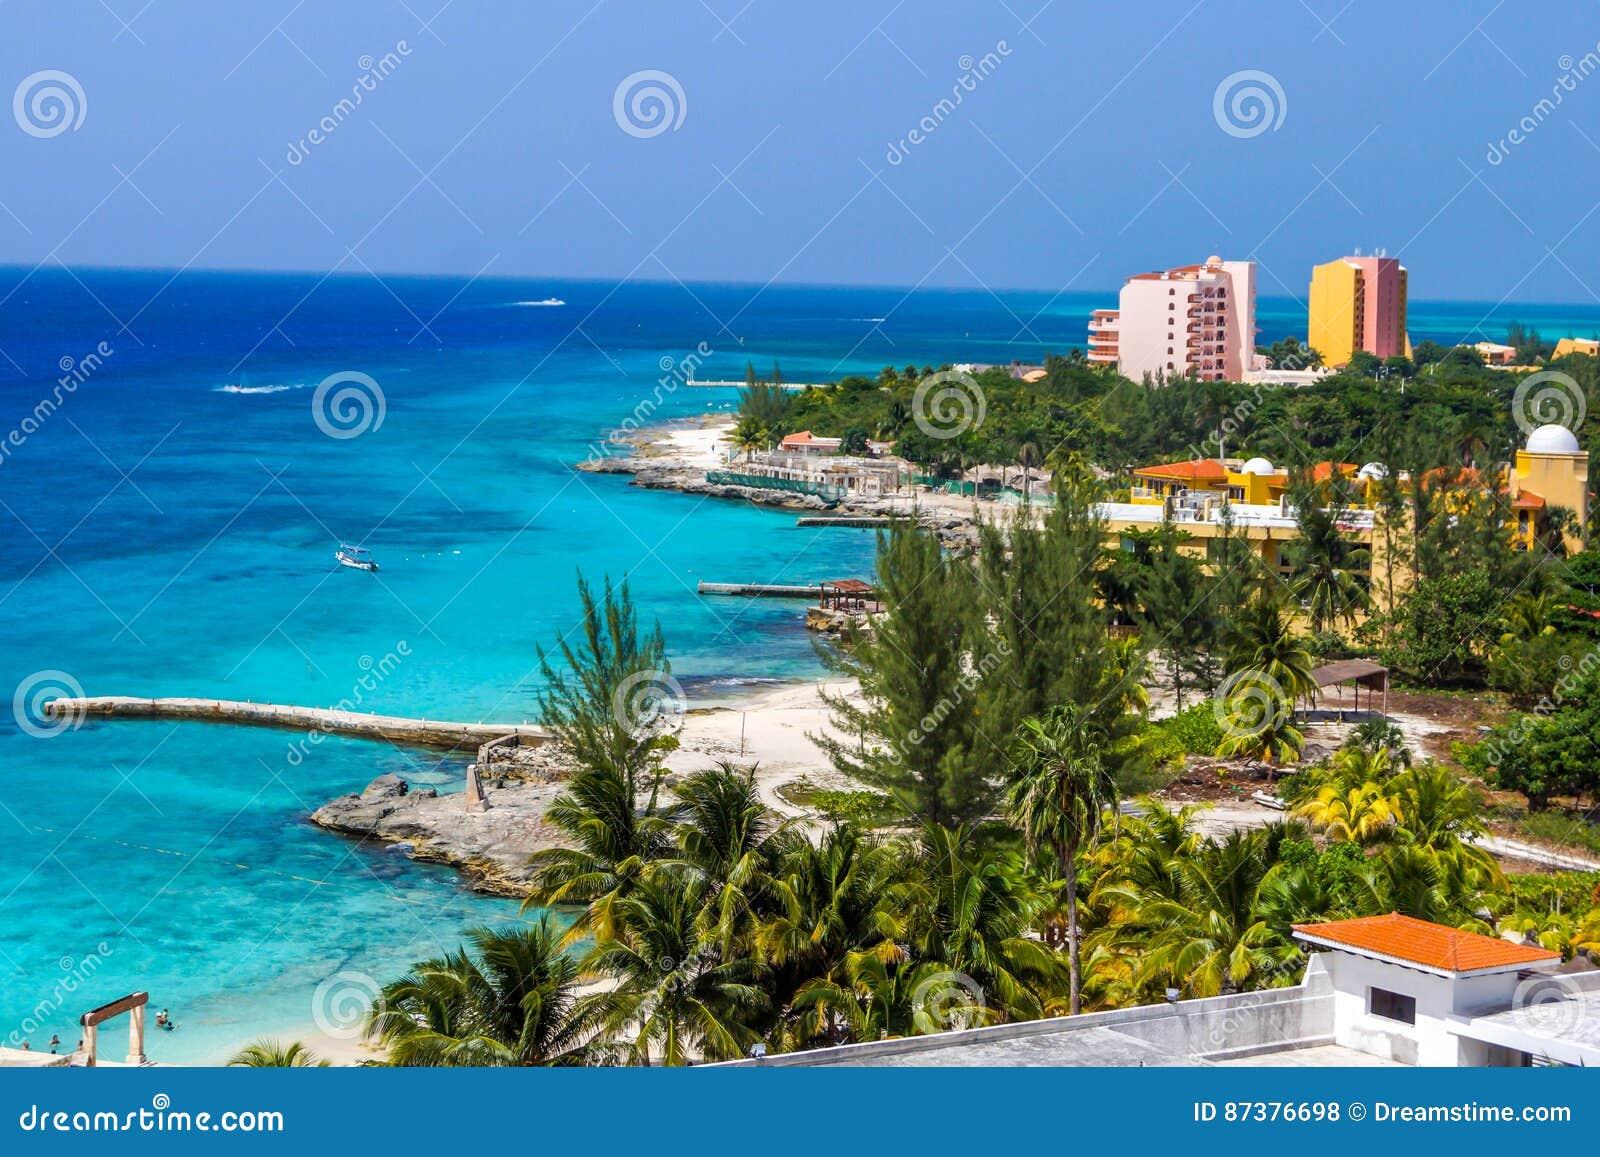 Resorts dot shoreline on Caribbean island